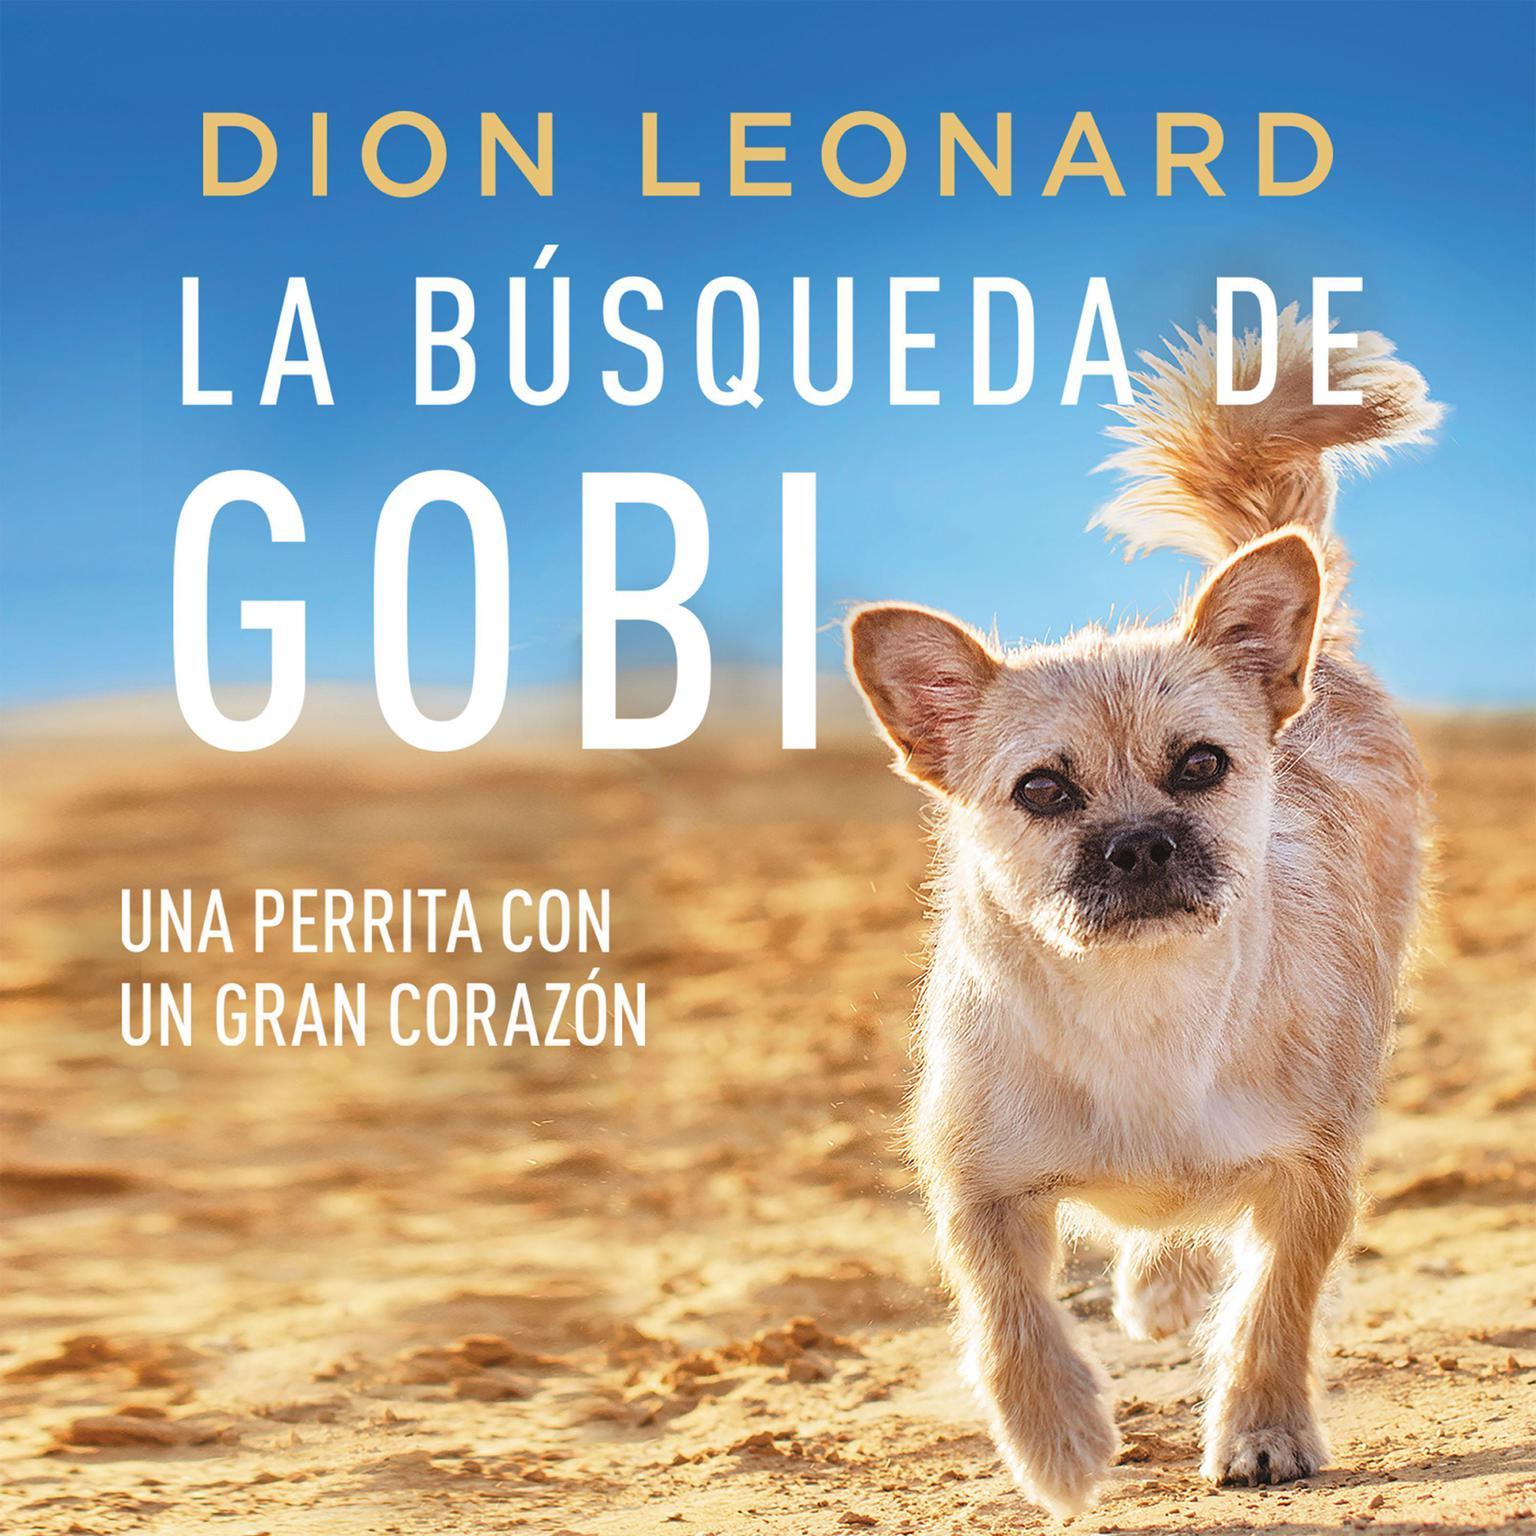 Printable La búsqueda de Gobi: Una perrita con un gran corazón (Una maravillosa historia real) Audiobook Cover Art